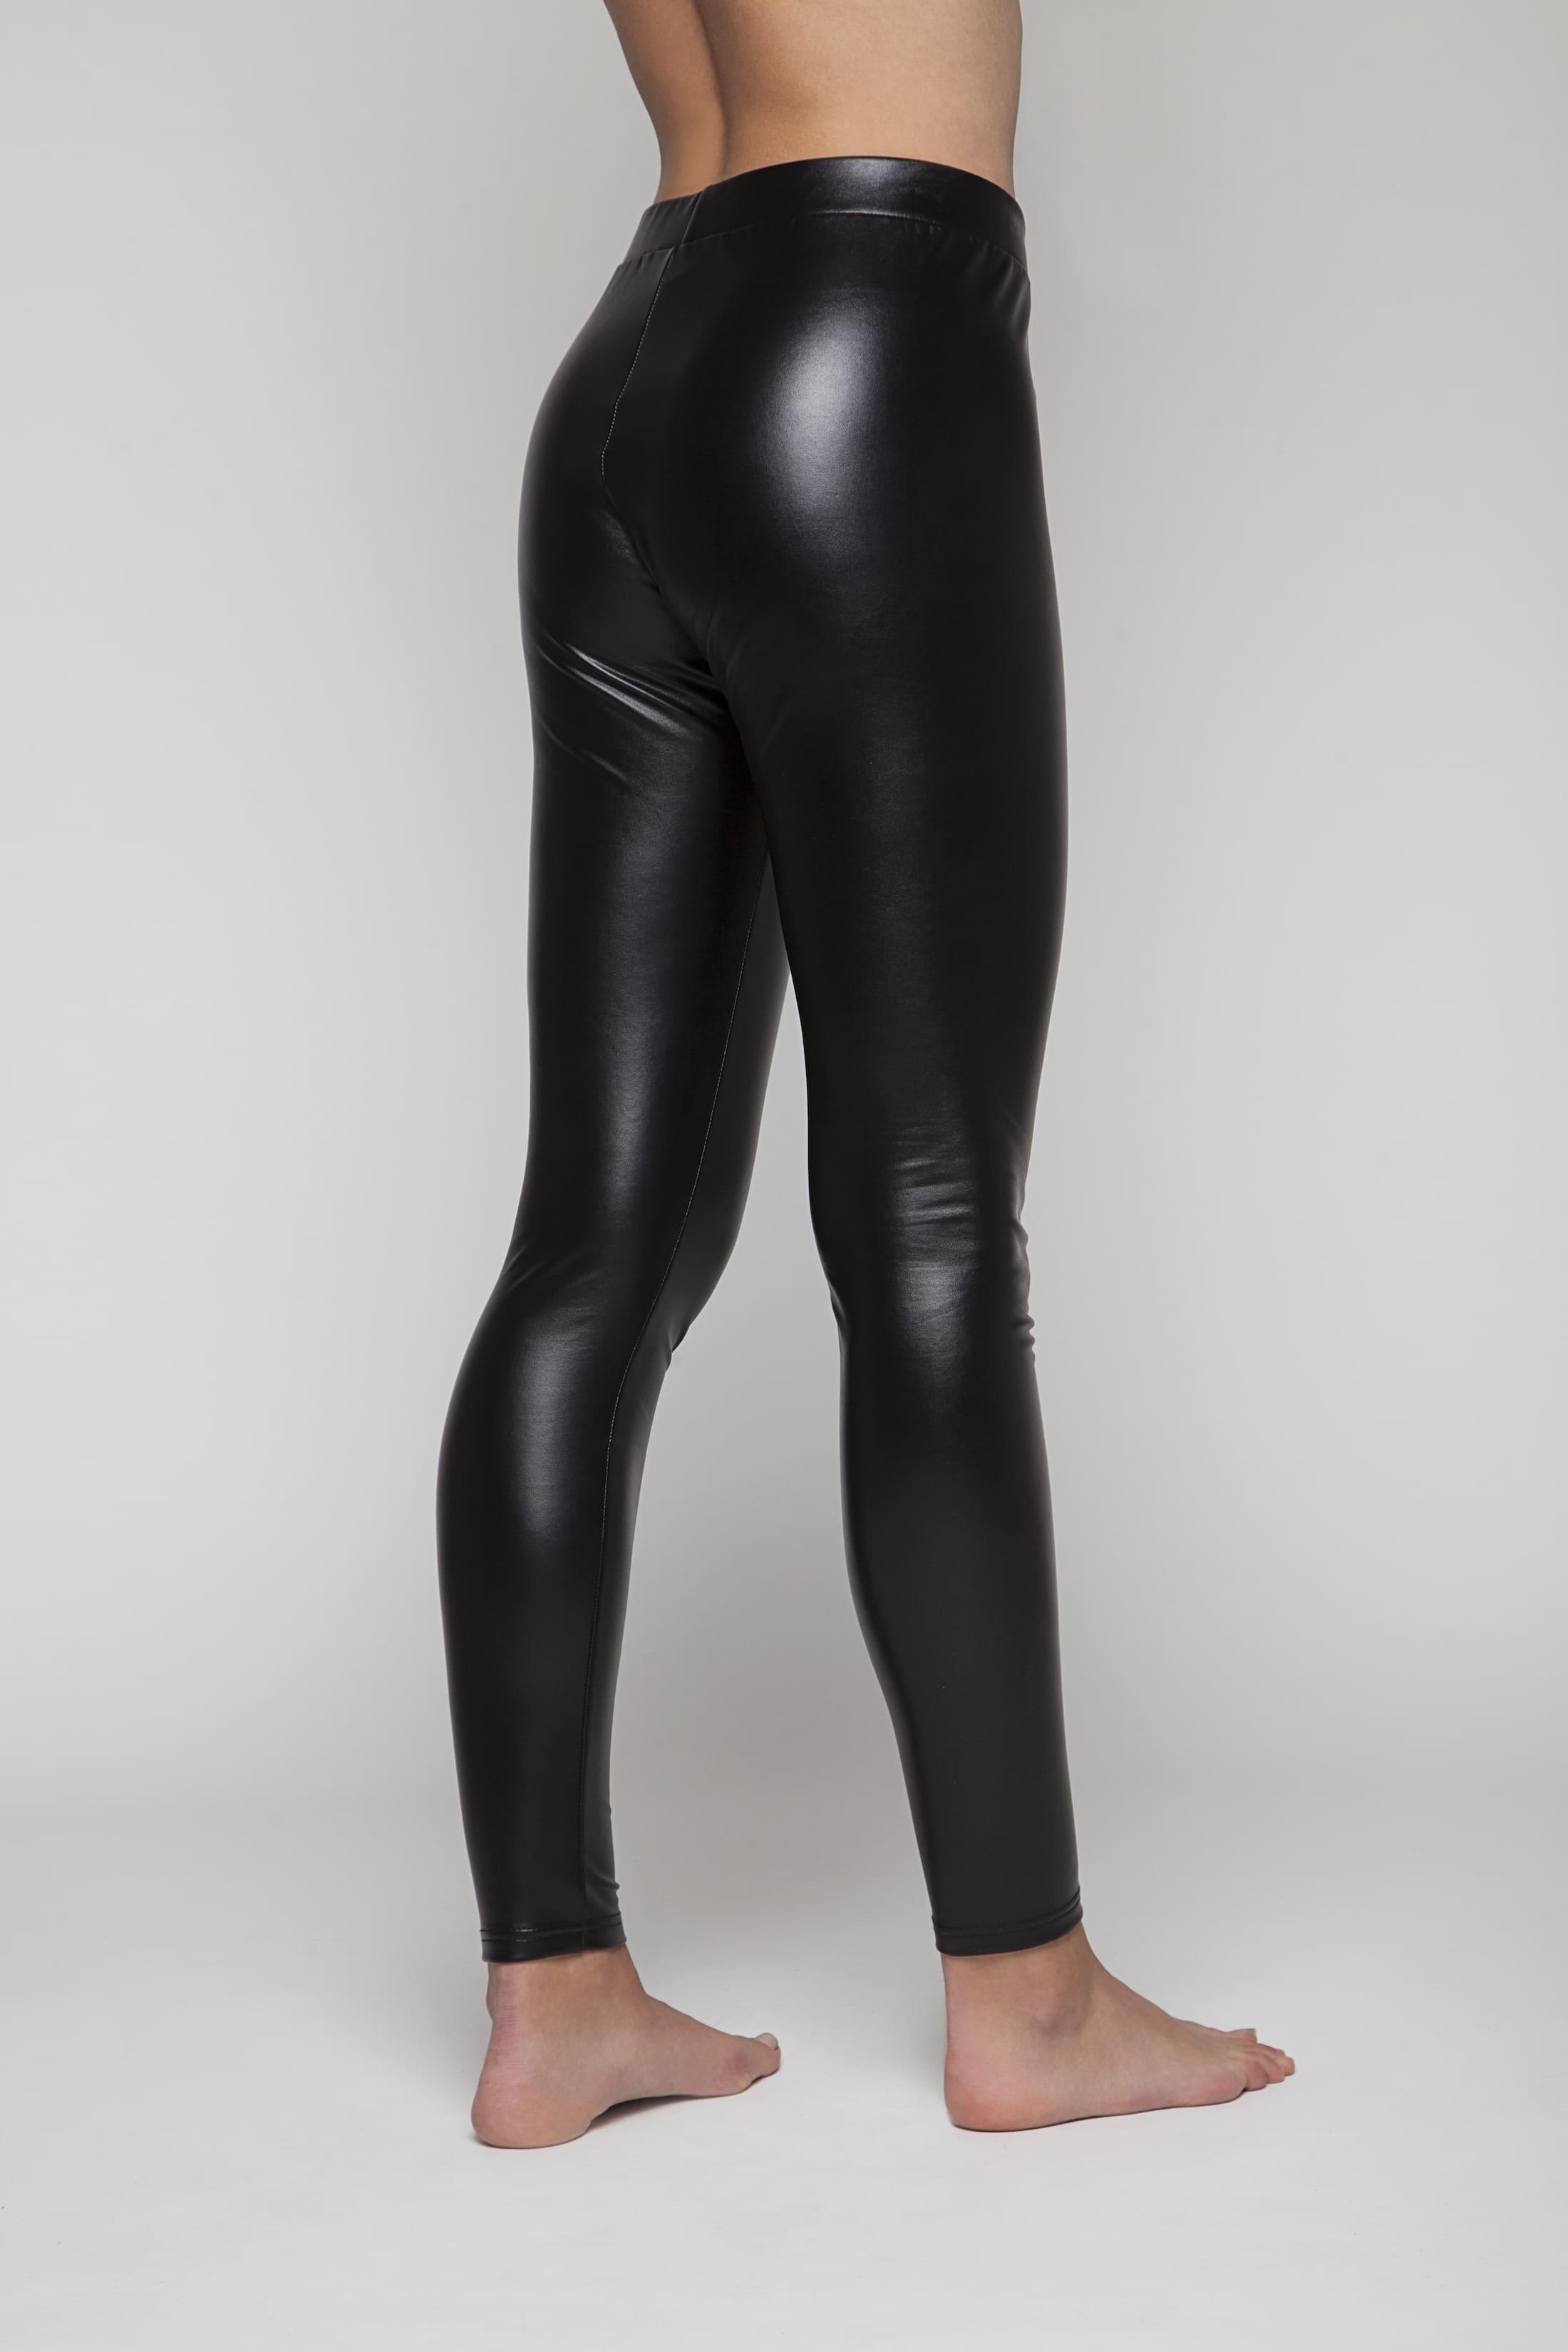 Black faux leather stretch leggings